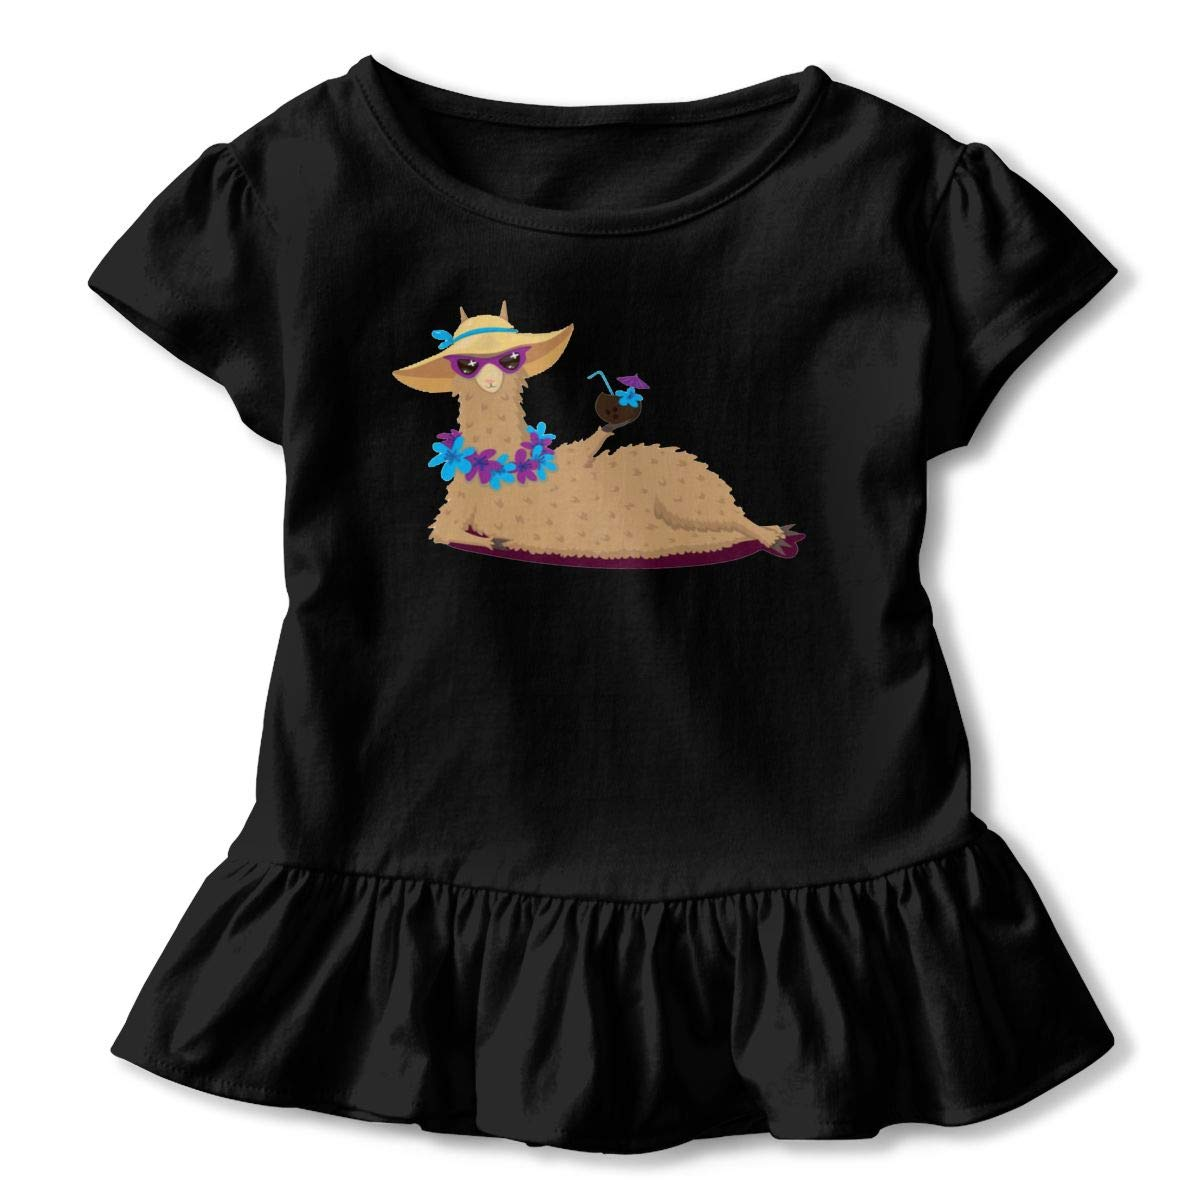 NMDJC CCQ Hawaiian Beach Llama Baby Skirts Cute Kids T Shirt Dress Comfortable Flounces Skort